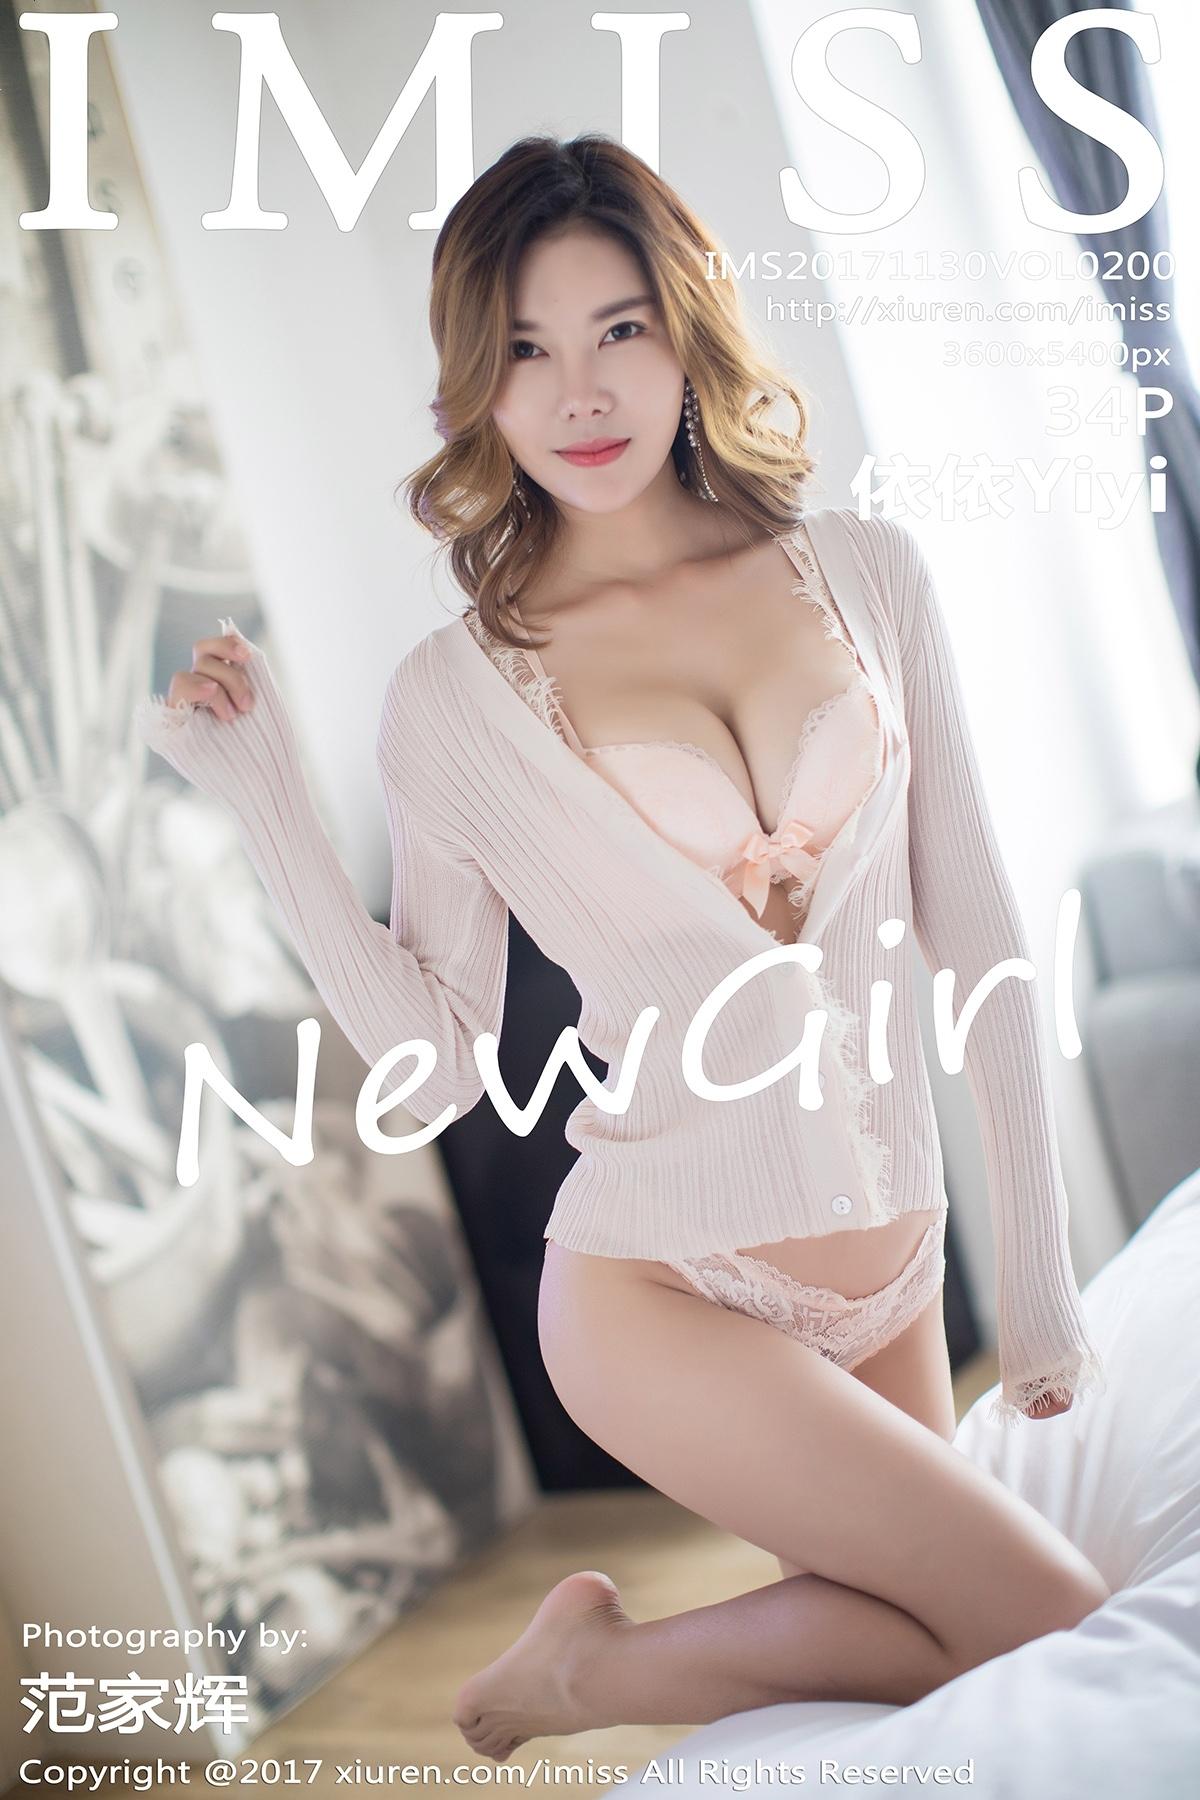 IMiss爱蜜社 2017.11.30 Vol.200 依依Yiyi